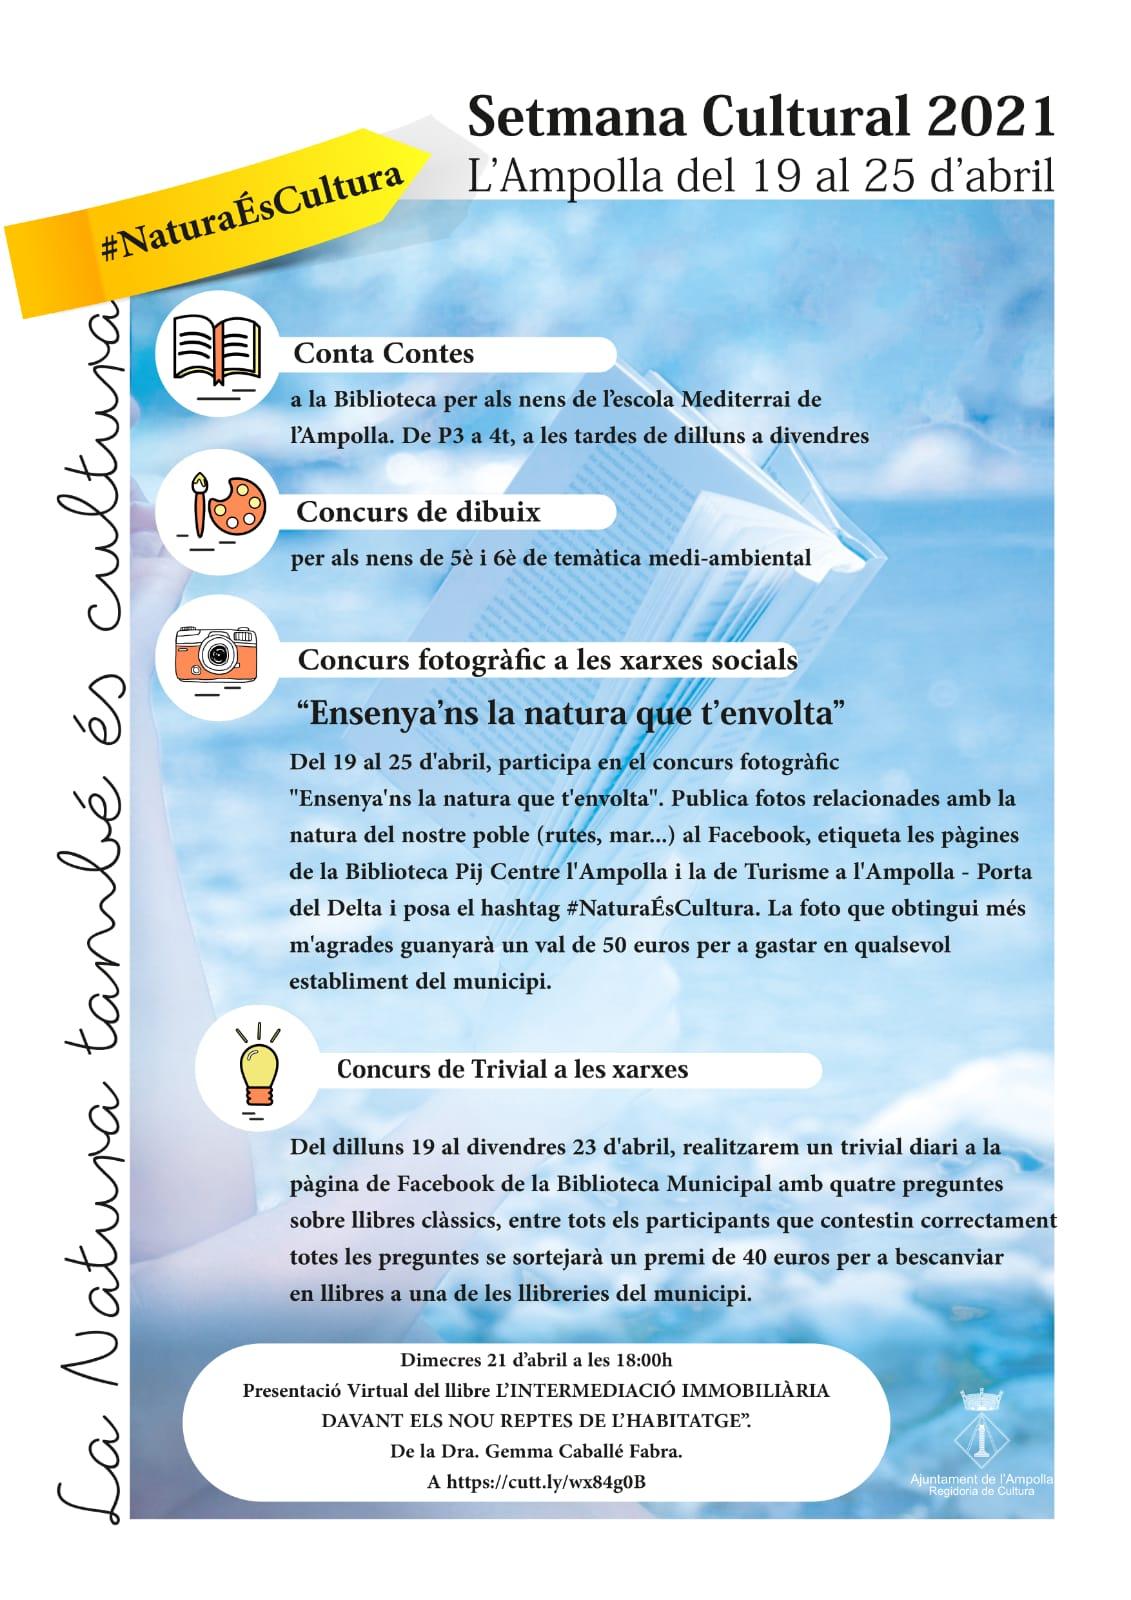 cartell-setmana-cultural-2021-lampolla